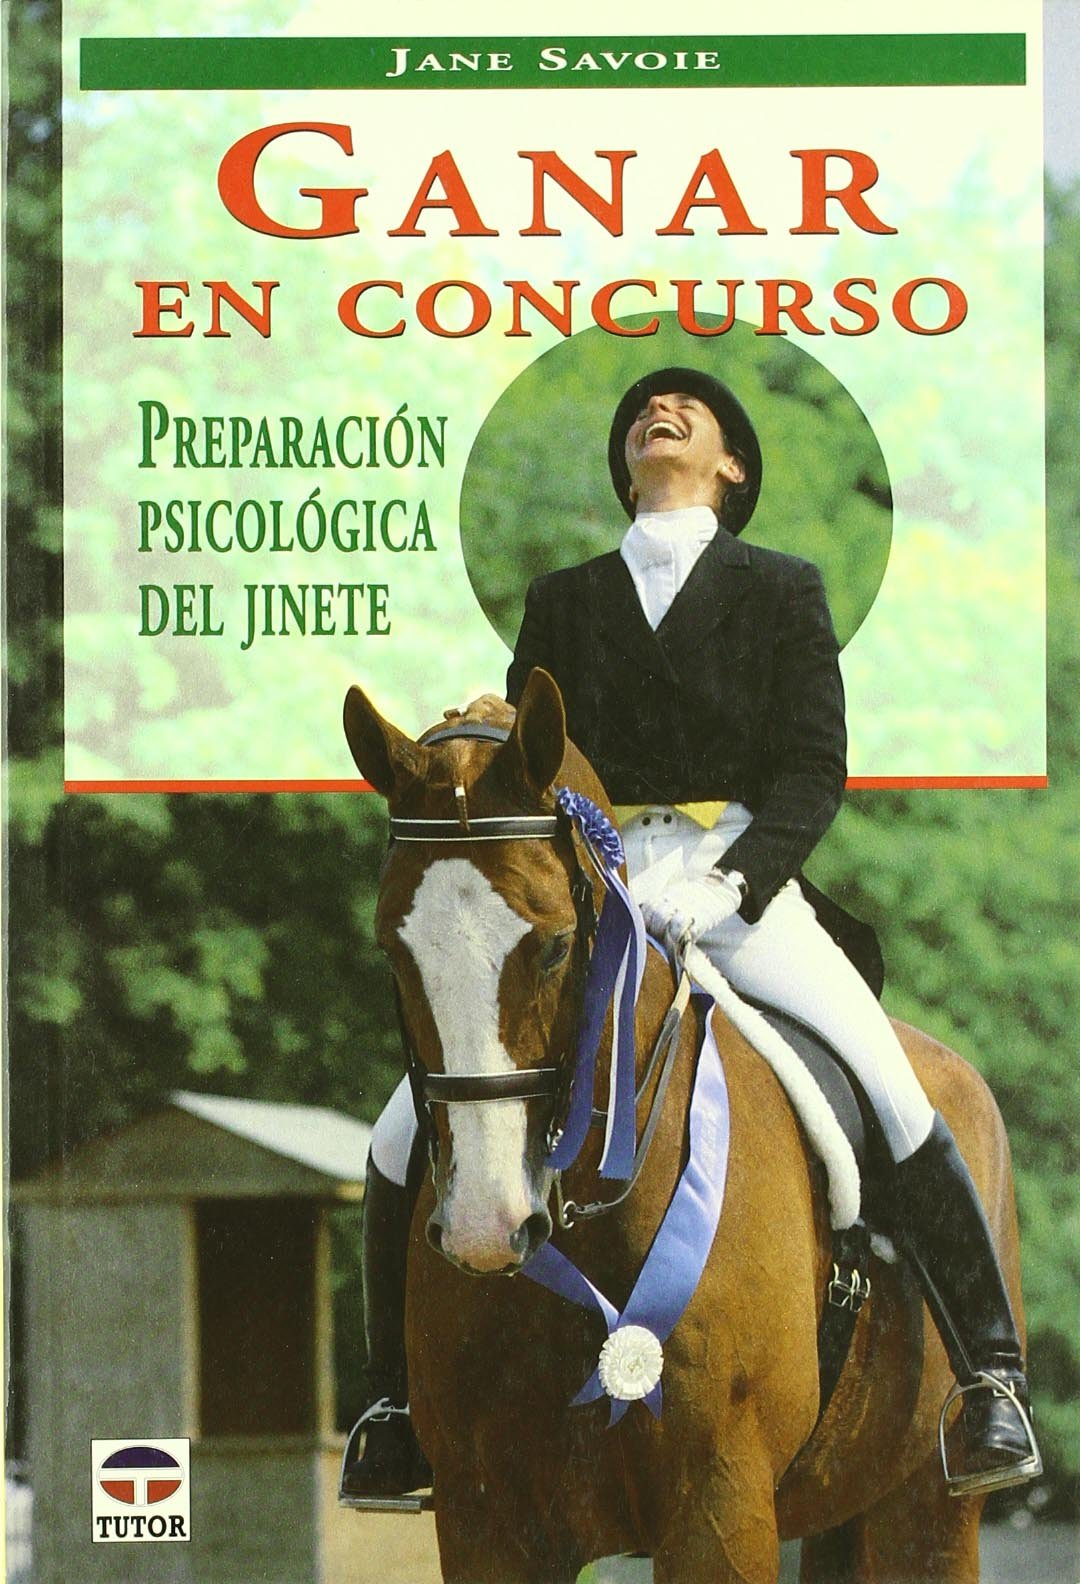 Ganar En Concurso Tapa blanda – 20 ago 2003 Jane Savoie Tutor 8479024119 BOG_LIB_U_012368